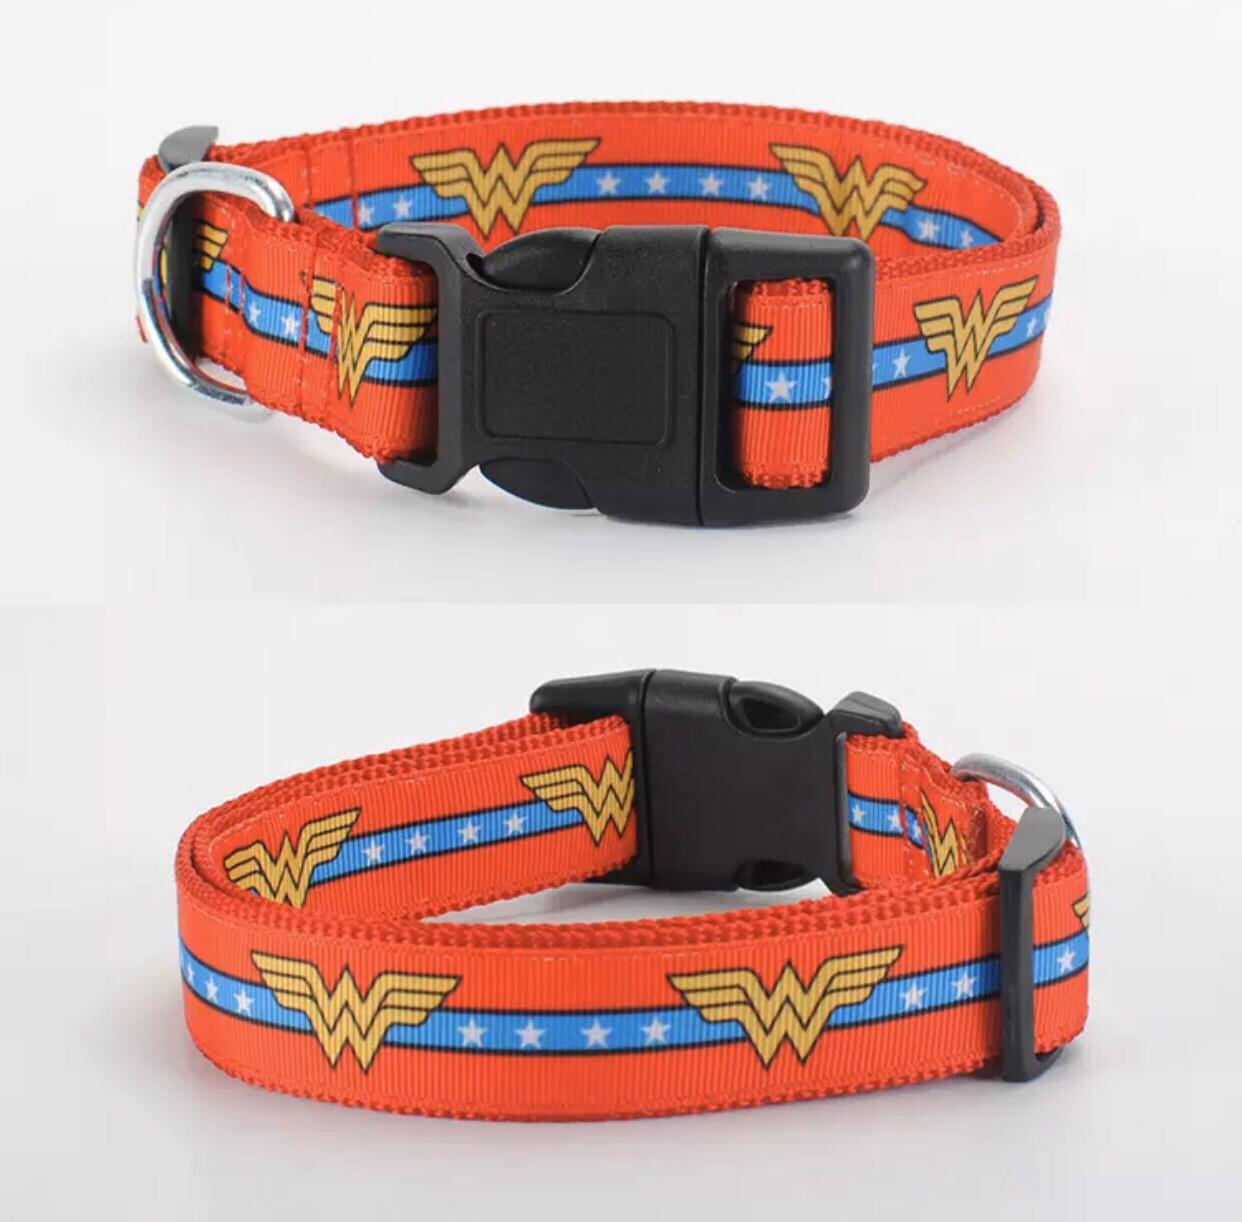 Wonder Woman Leash And Collar Set